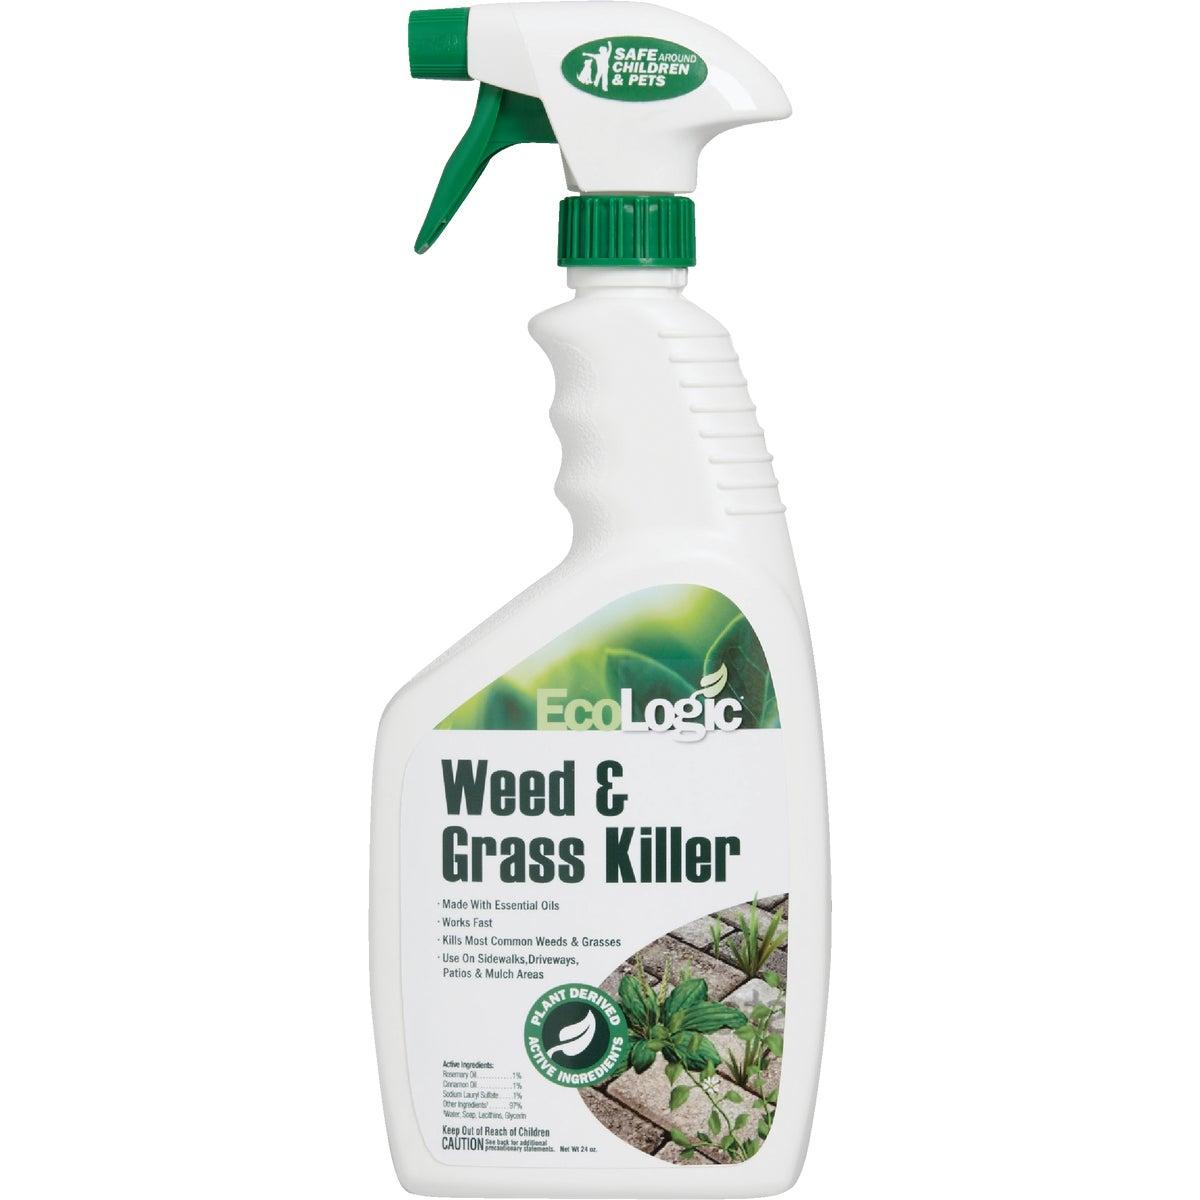 24OZ WEED & GRASS KILLR